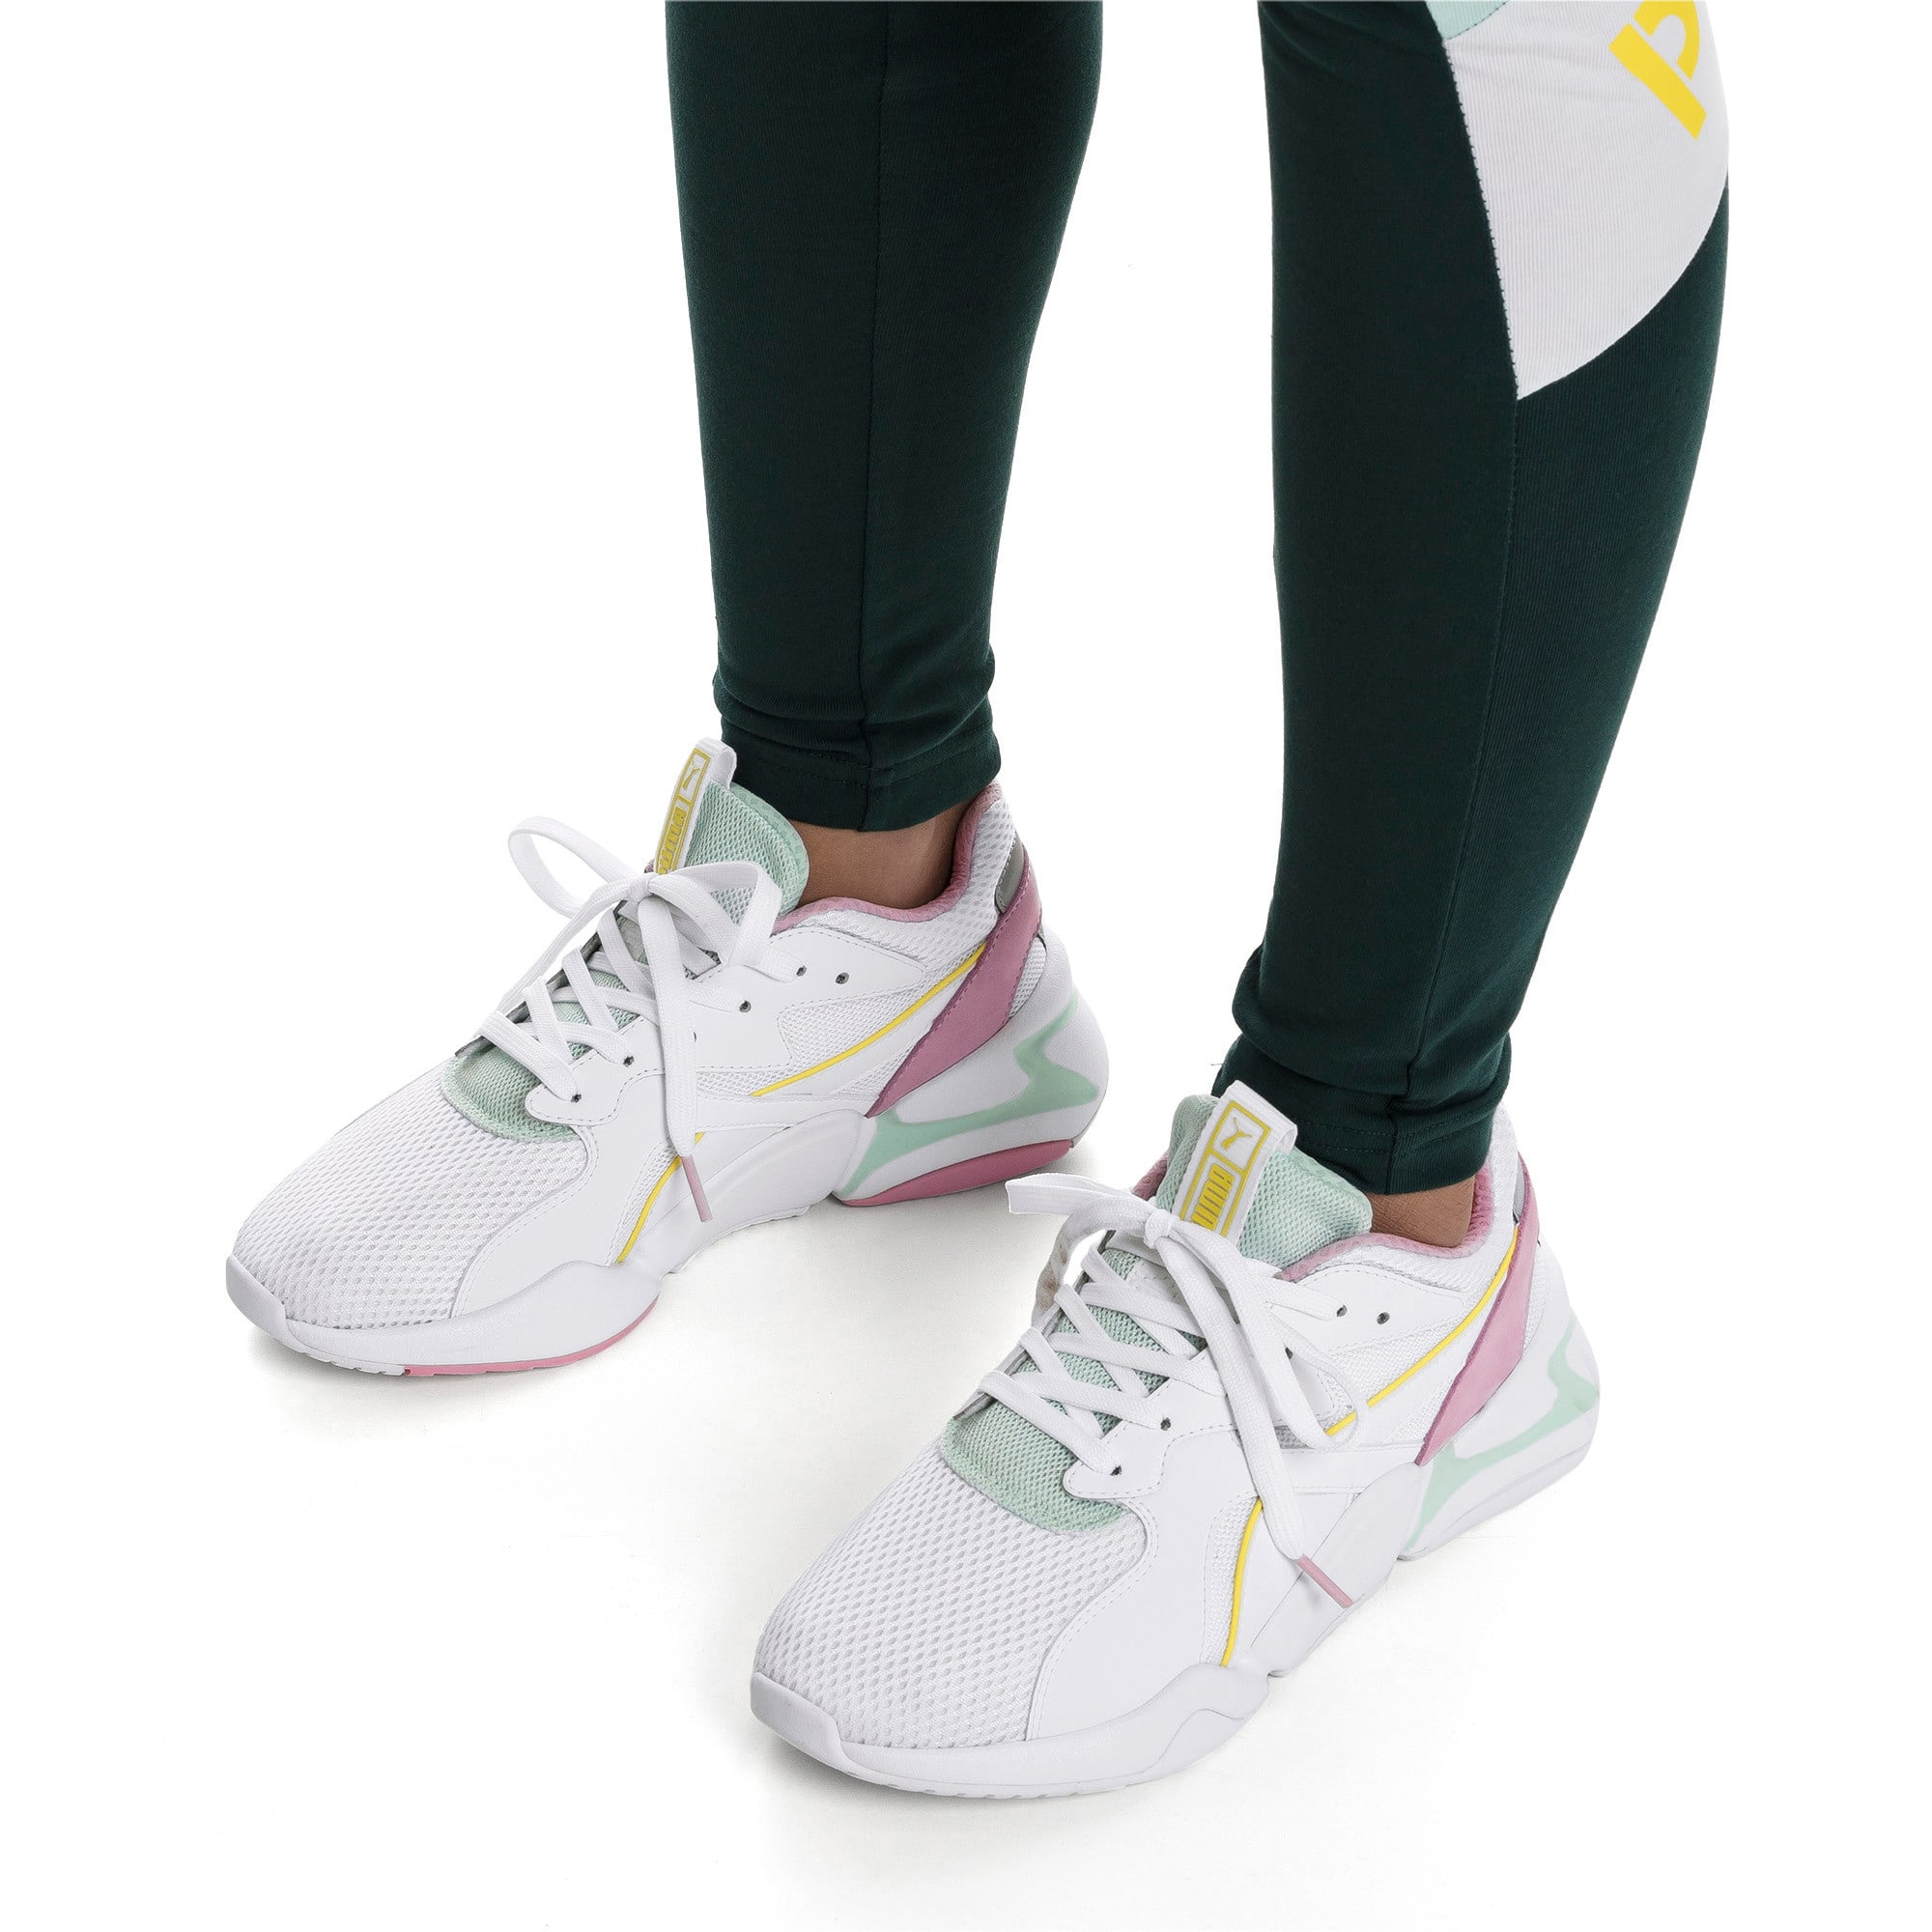 Thumbnail 2 of Nova Mesh Women's Sneakers, Puma White-Fair Aqua, medium